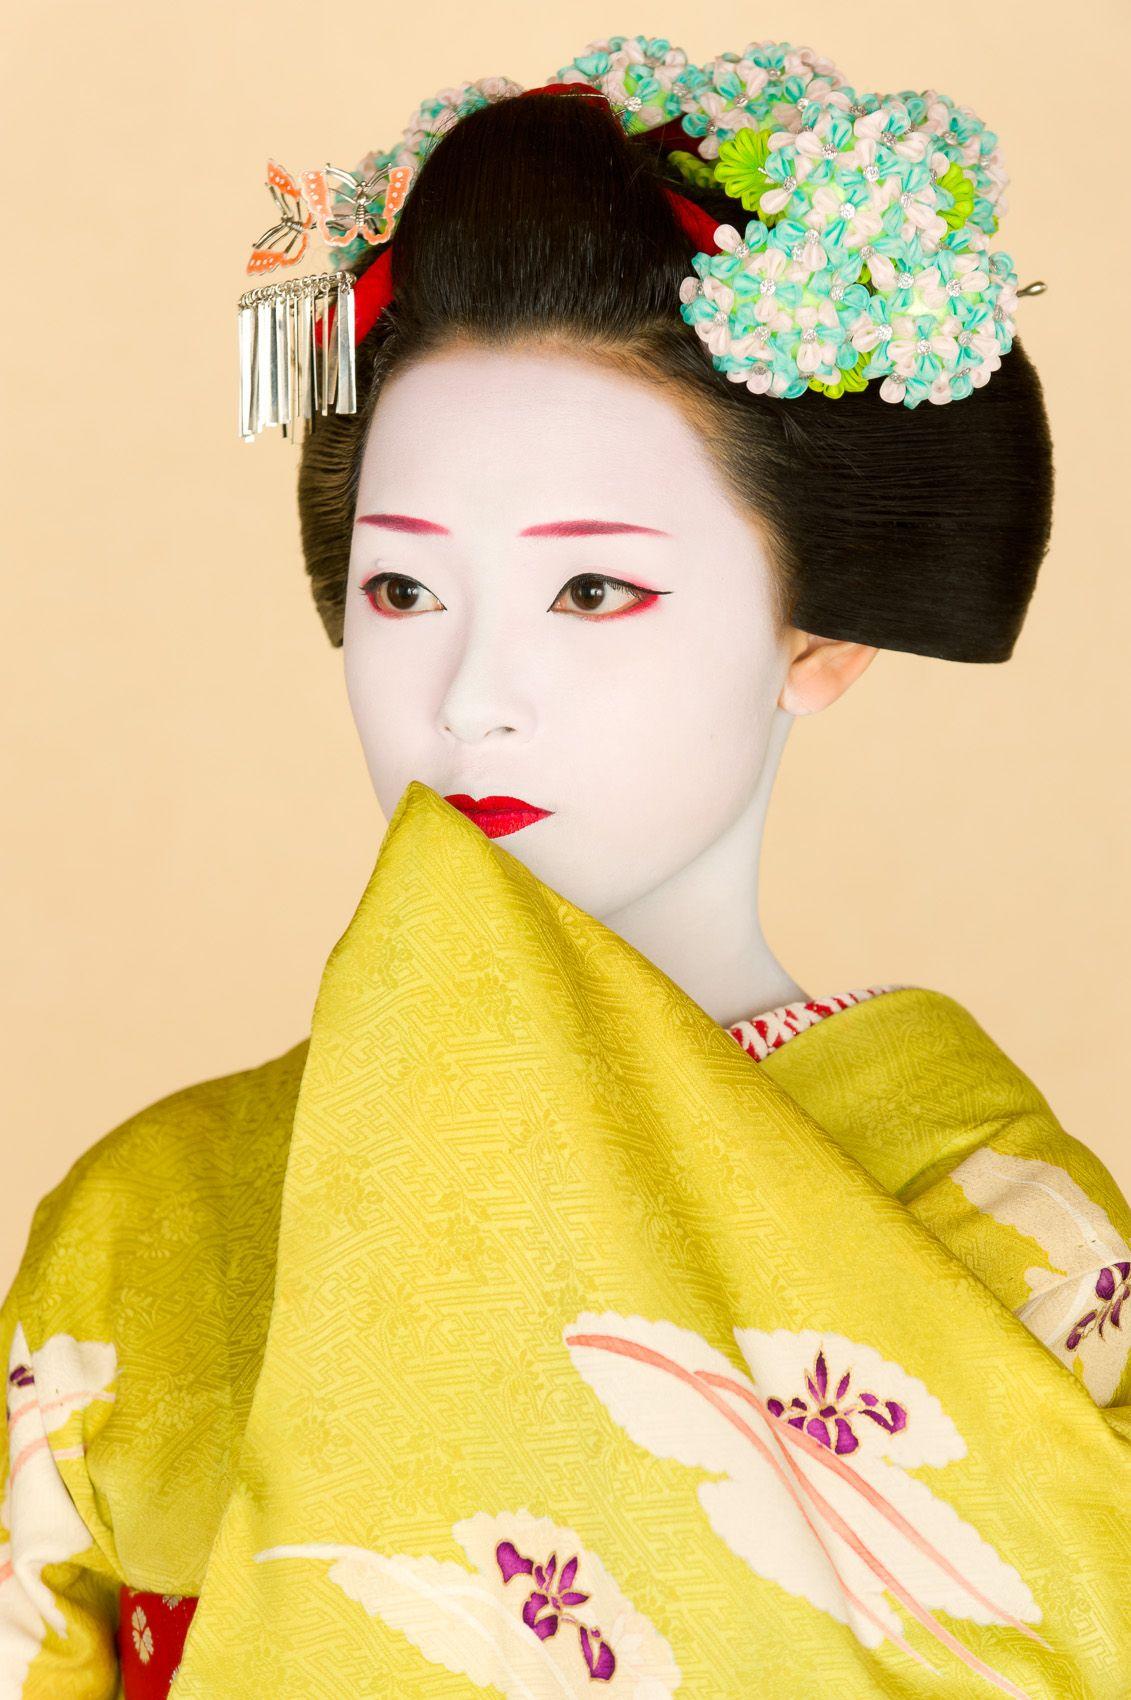 A beautiful geisha with a bbc mh 6